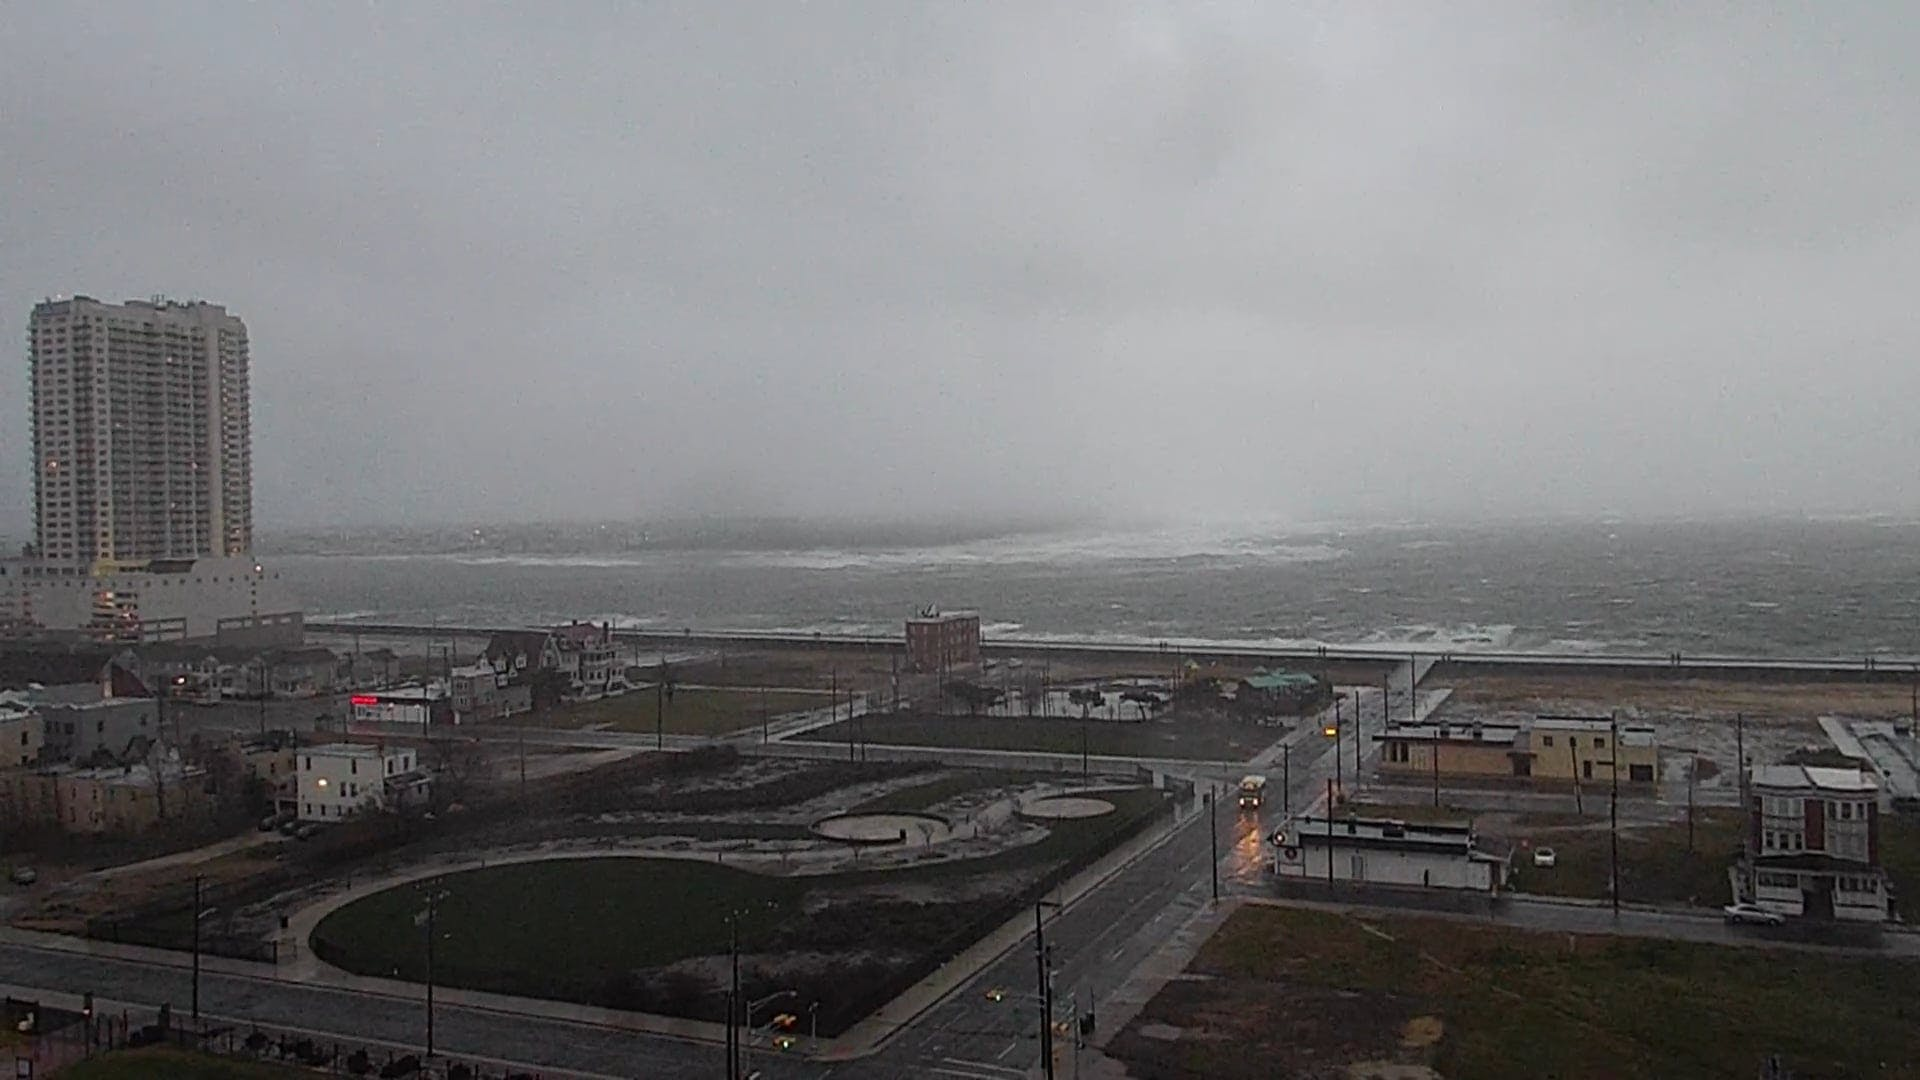 Big Waves Crashing Due To Storm